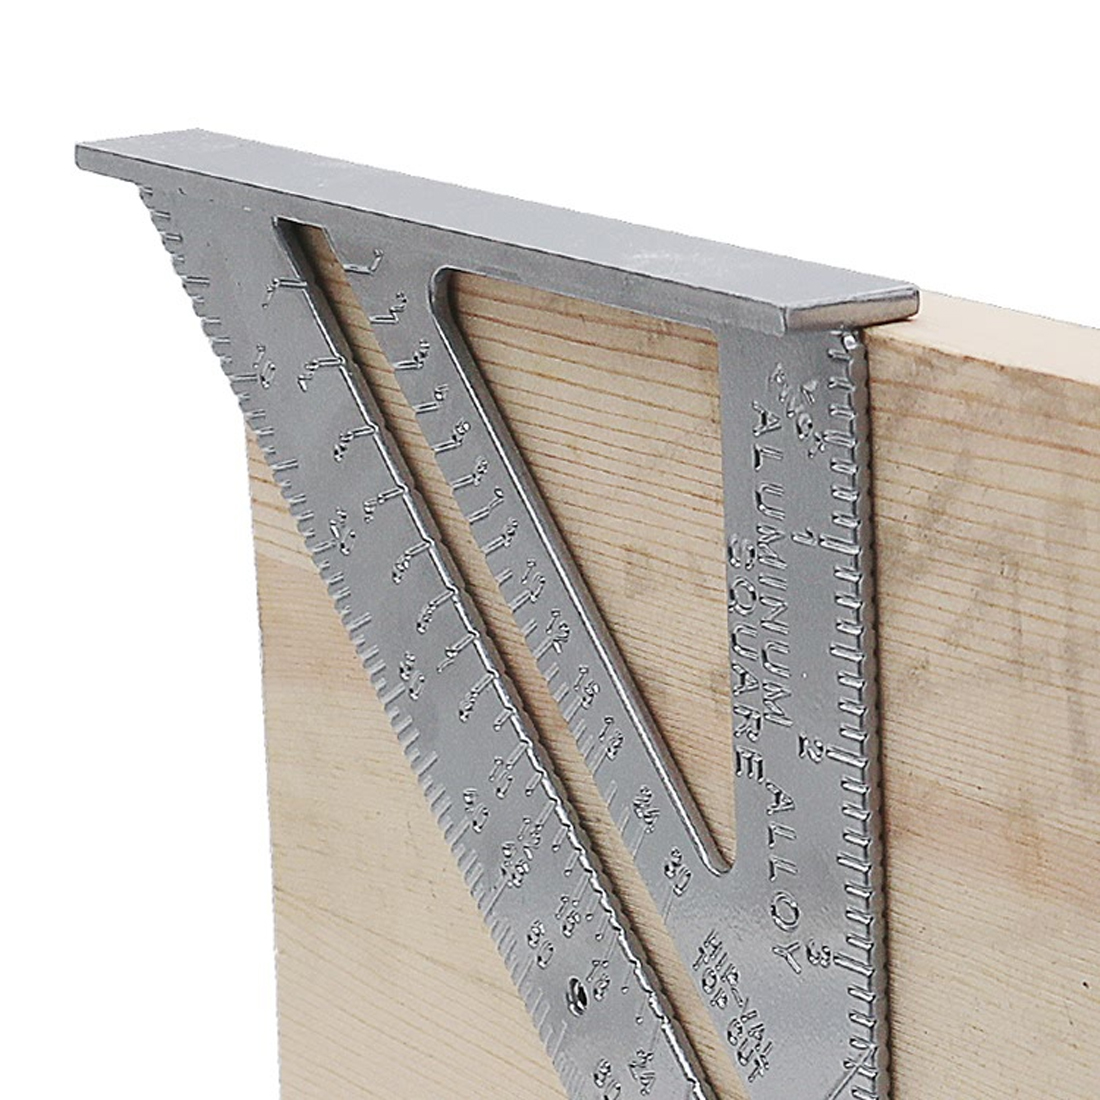 Measurement Inch Carpenter Ruler Speed Square Protractor Aluminum Alloy Miter Framing Tri square Line Scriber Saw Guide Gauges     - title=